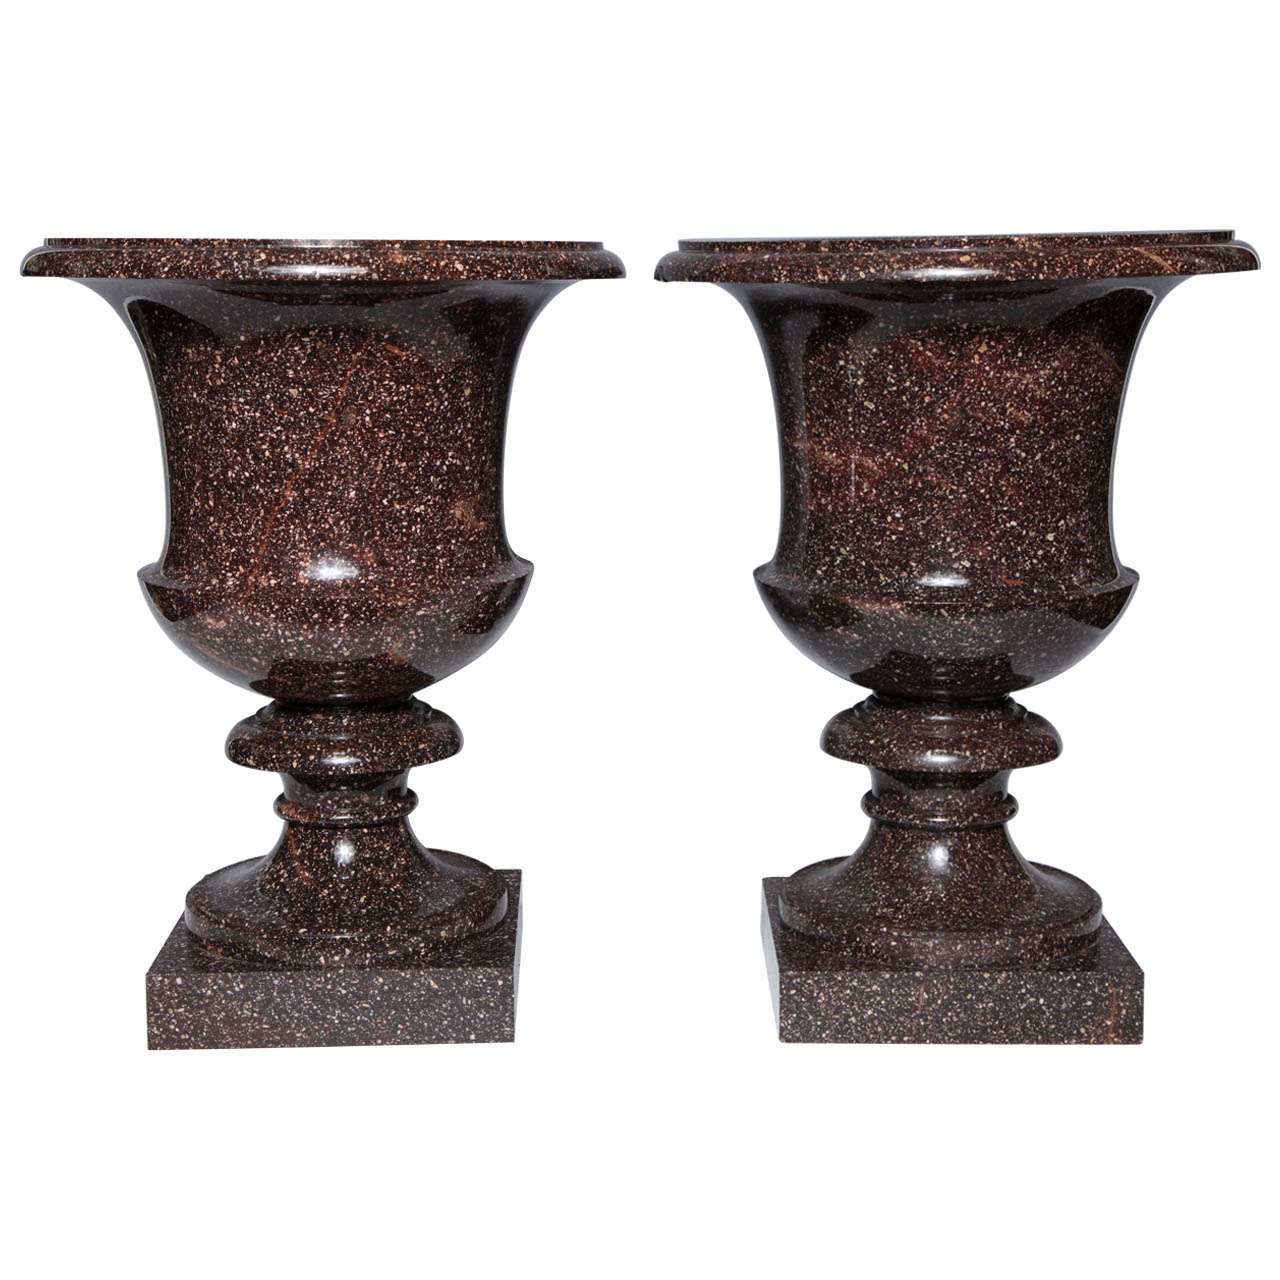 Monumental pair of neoclassical period swedish porphyry campagna monumental pair of neoclassical period swedish porphyry campagna shaped vases for sale reviewsmspy